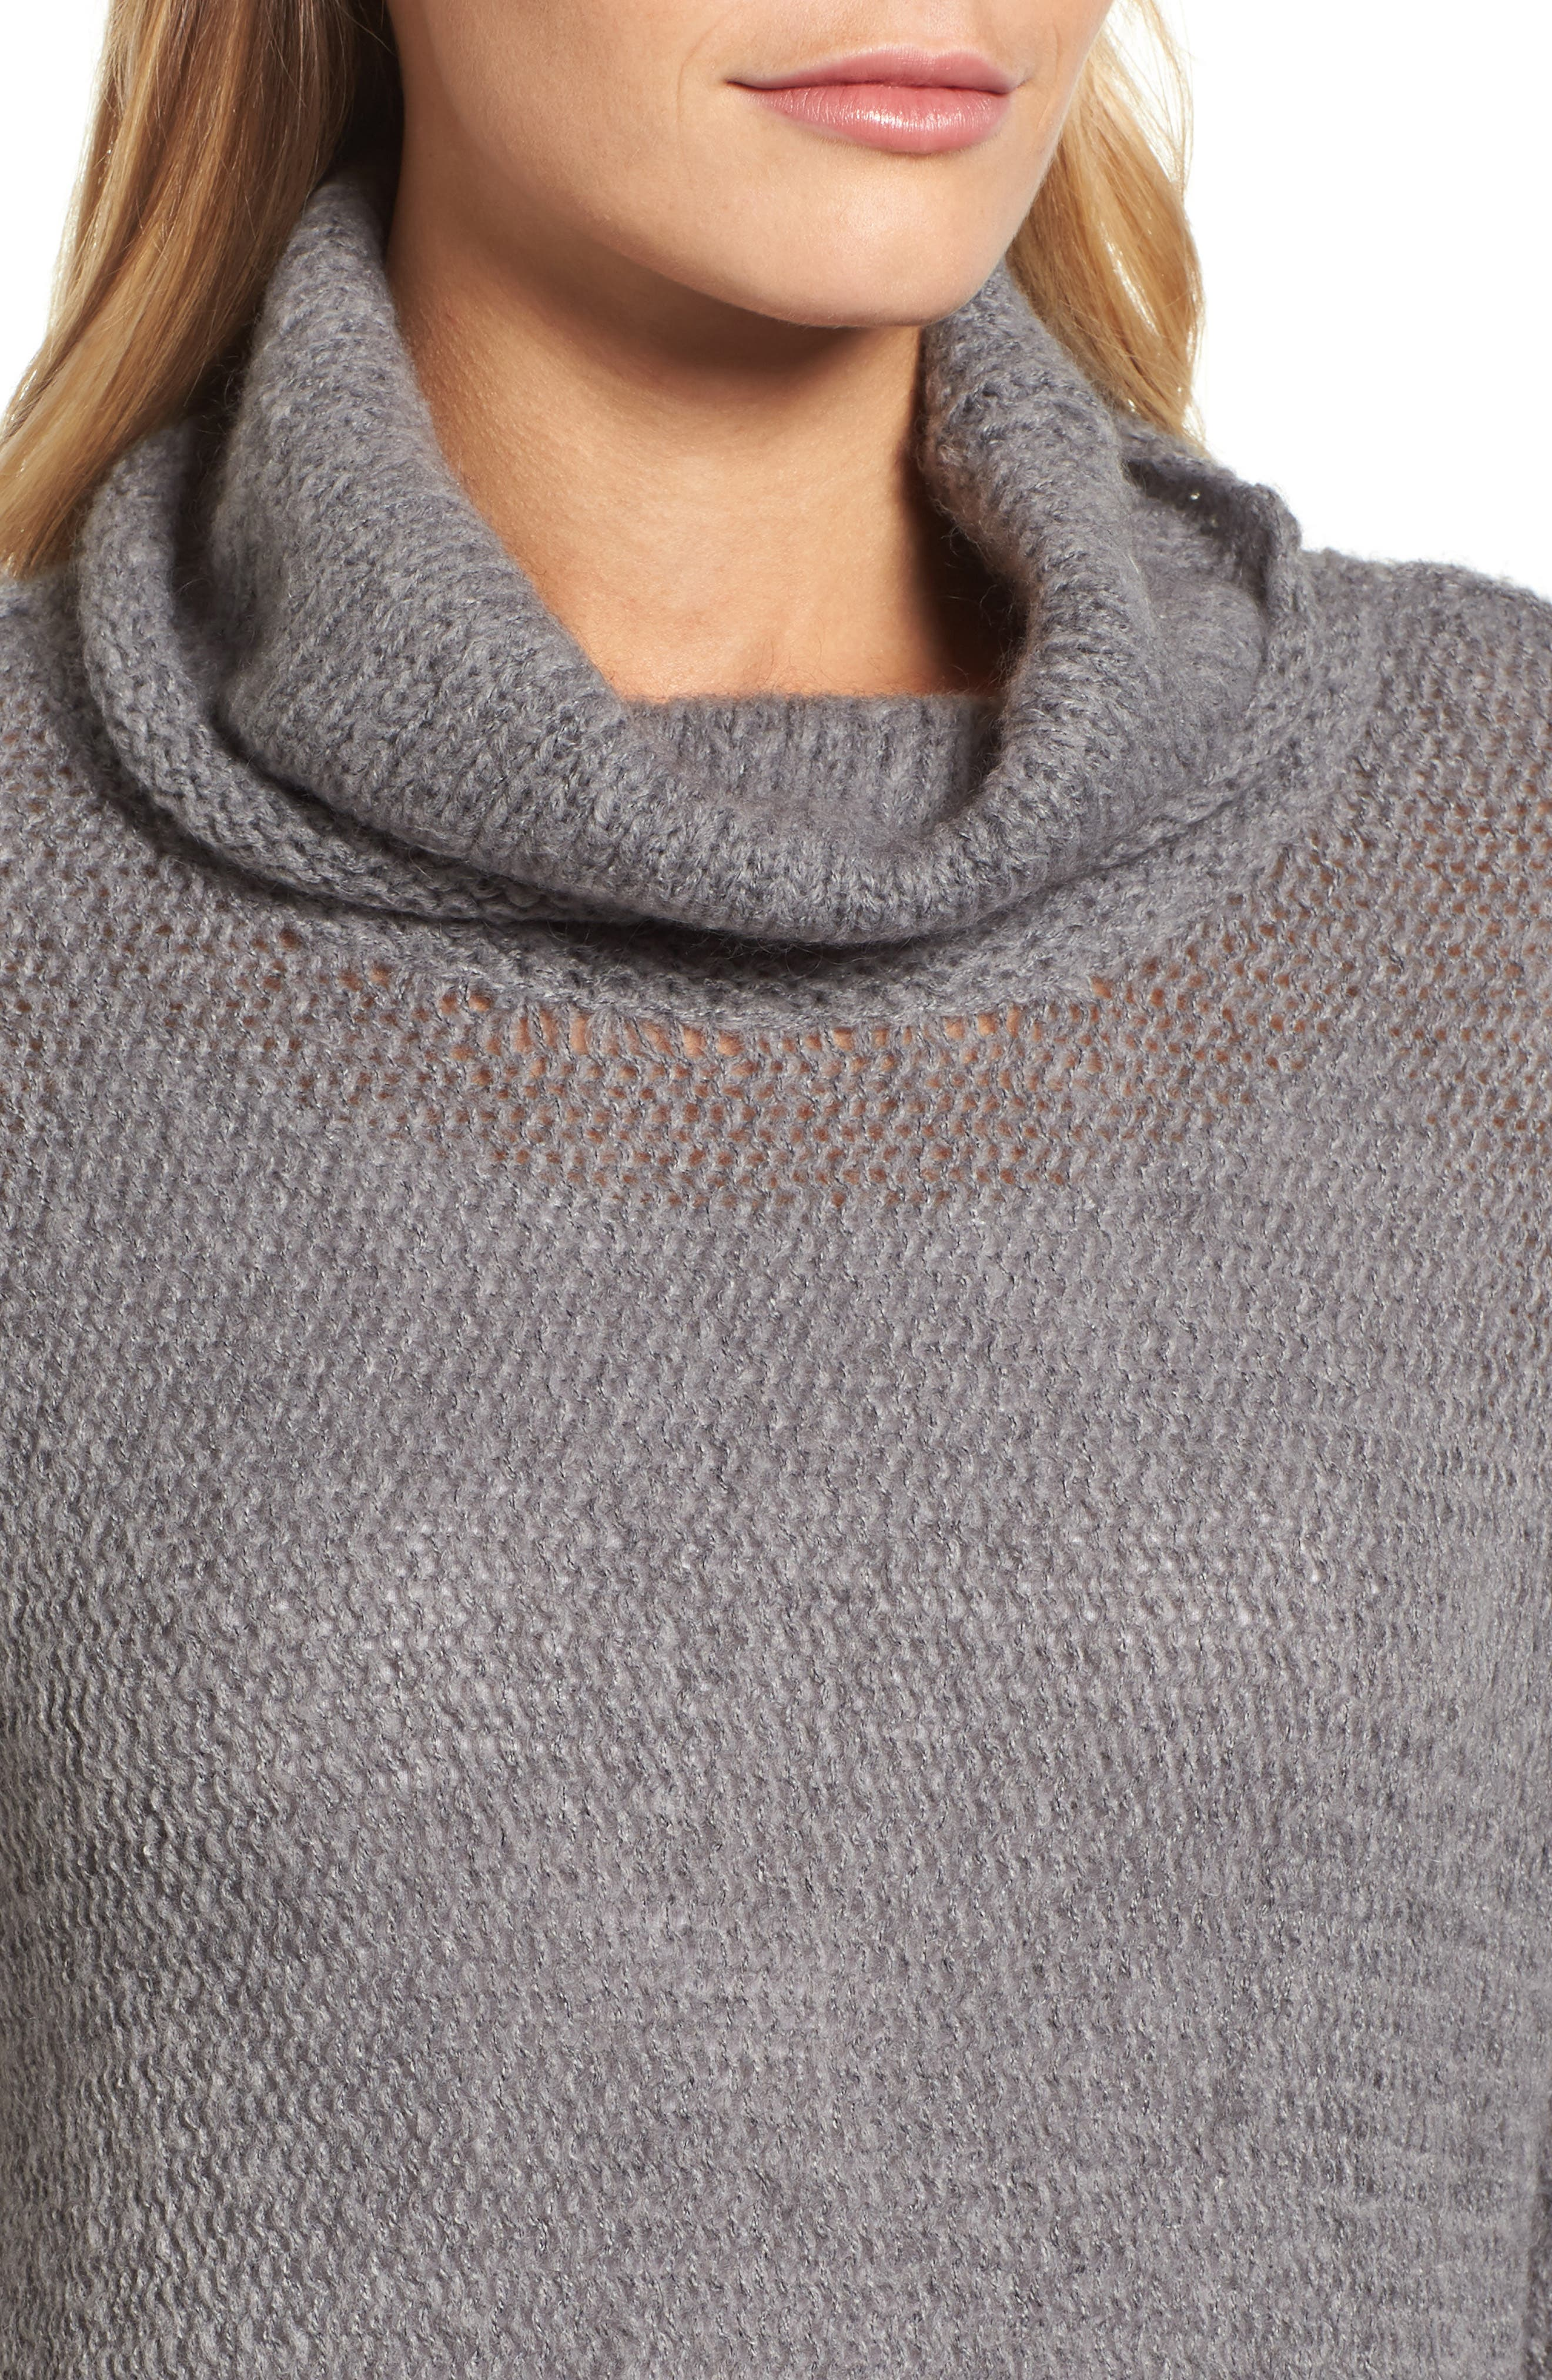 Tunic Sweater,                             Alternate thumbnail 4, color,                             GREY DARK HEATHER